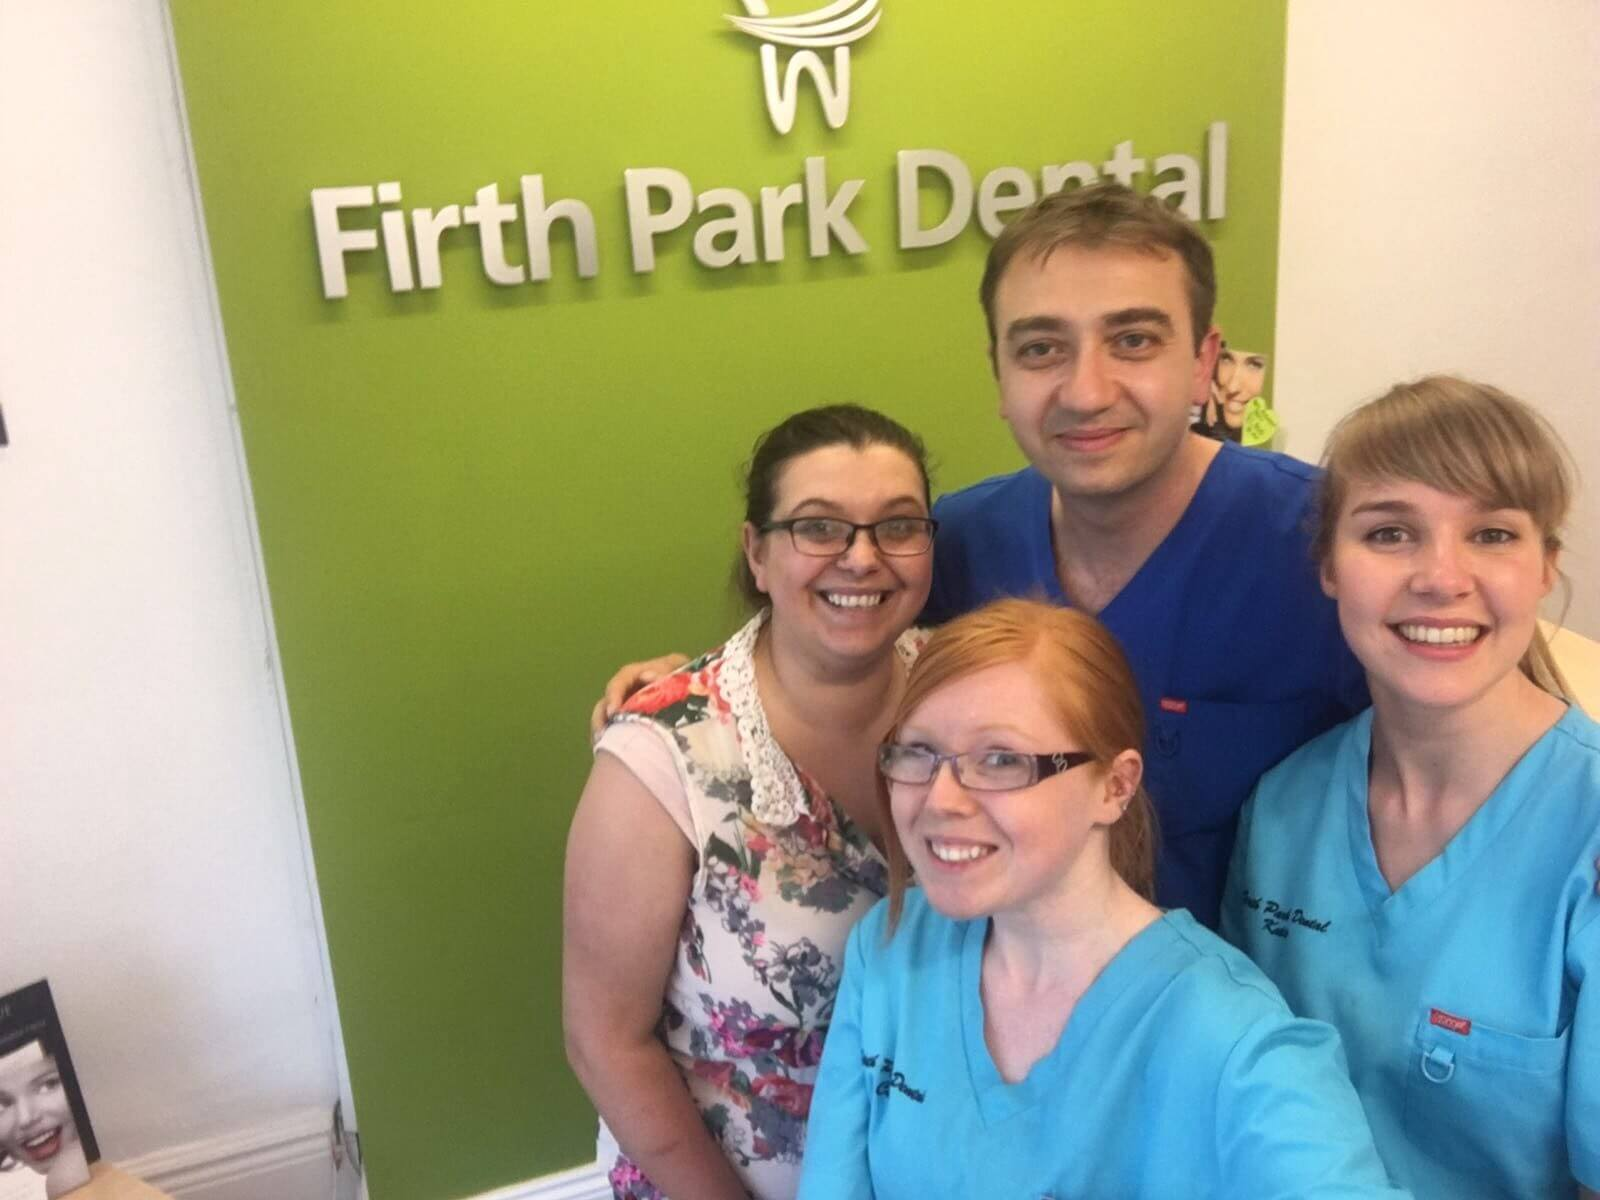 firth park dental